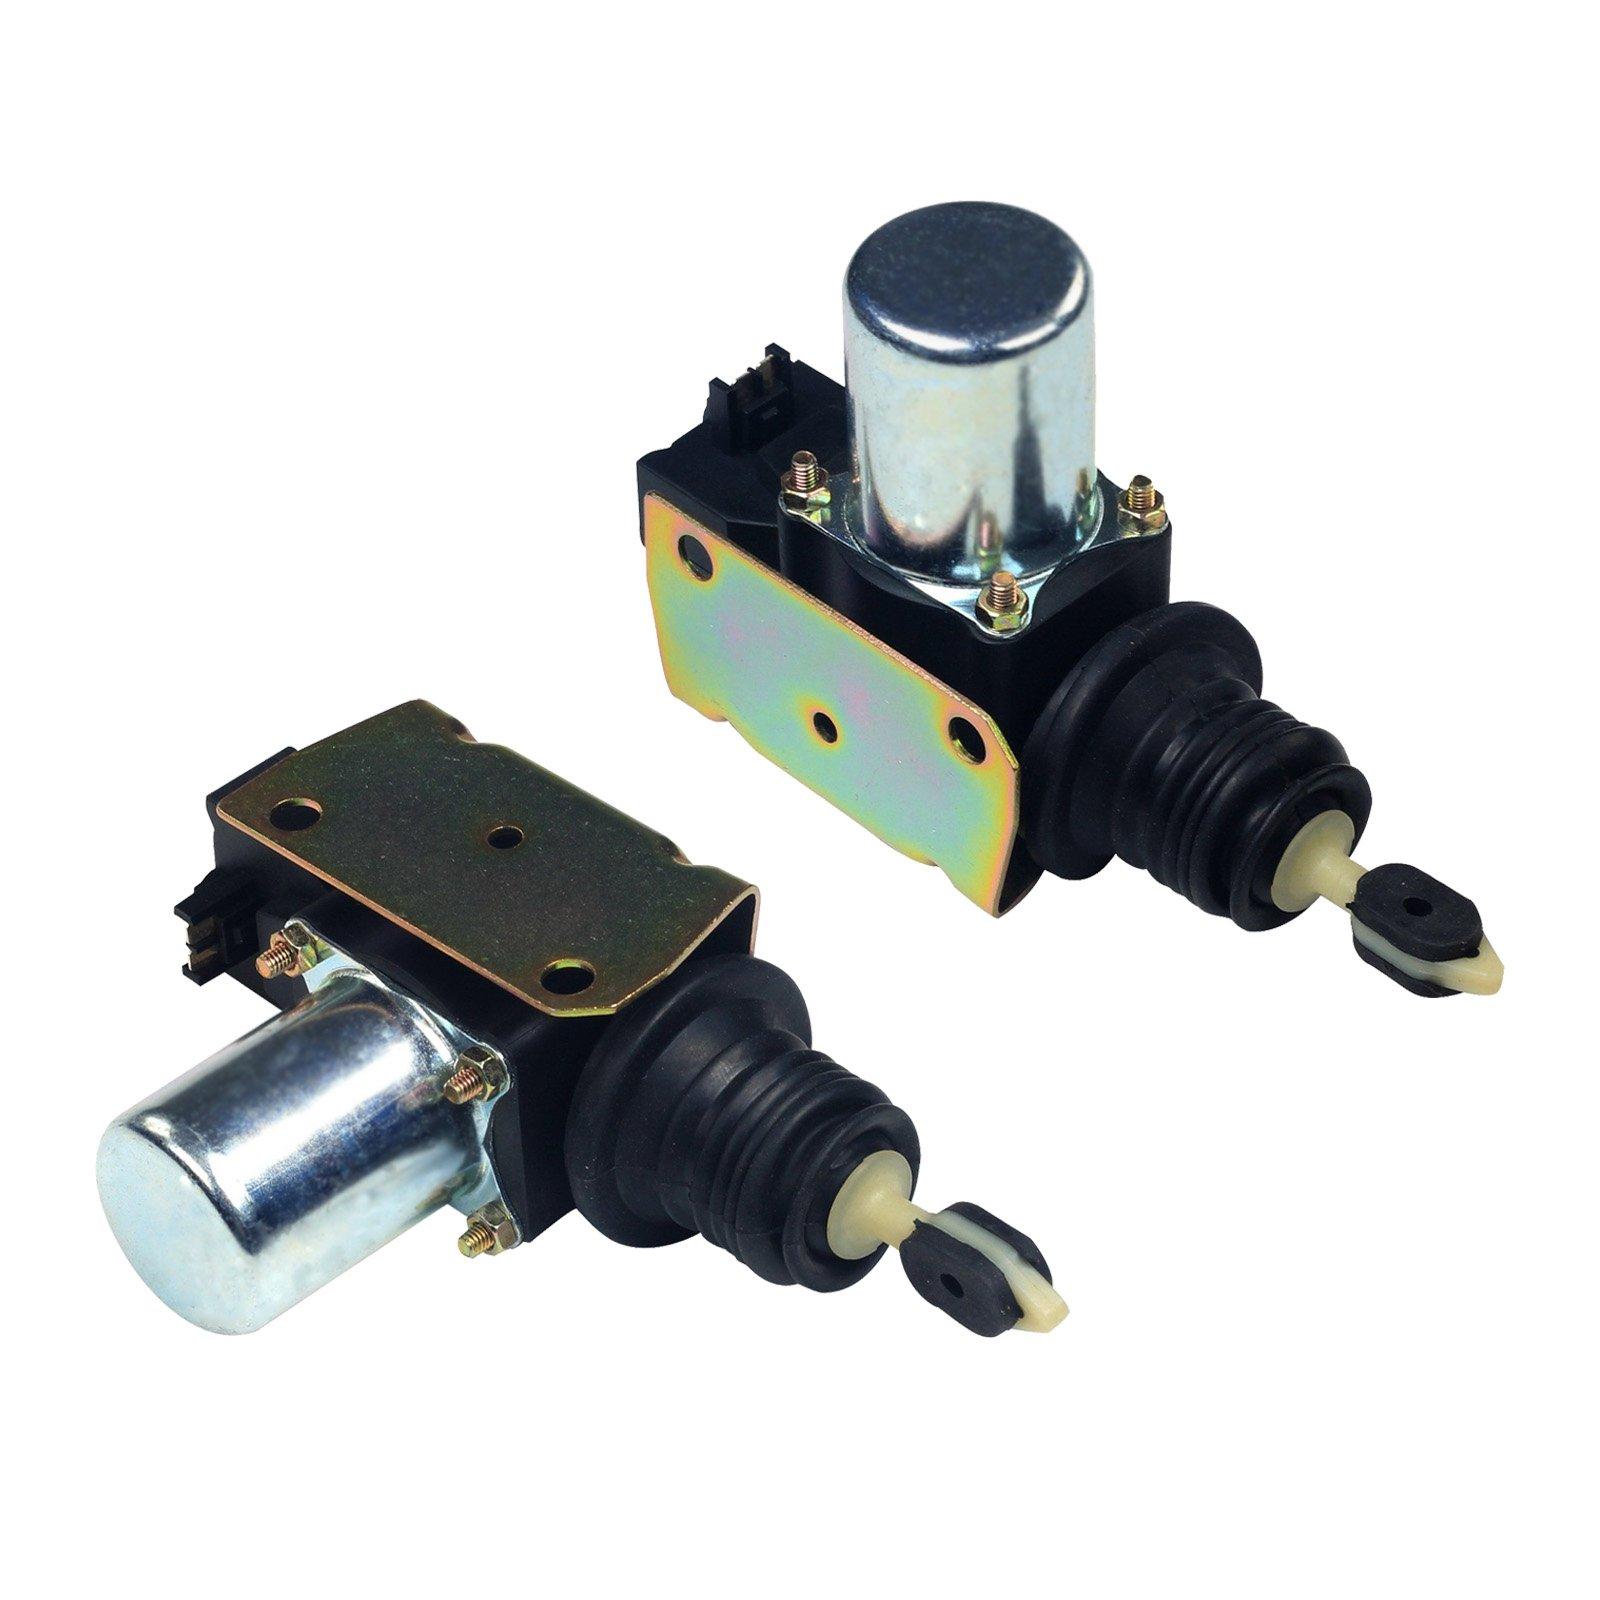 yjracing 2PCS Power Door Lock Actuator Pair Set Fit For Chevy GMC Pickup Truck Cadillac Pontiac 22020256 746-014